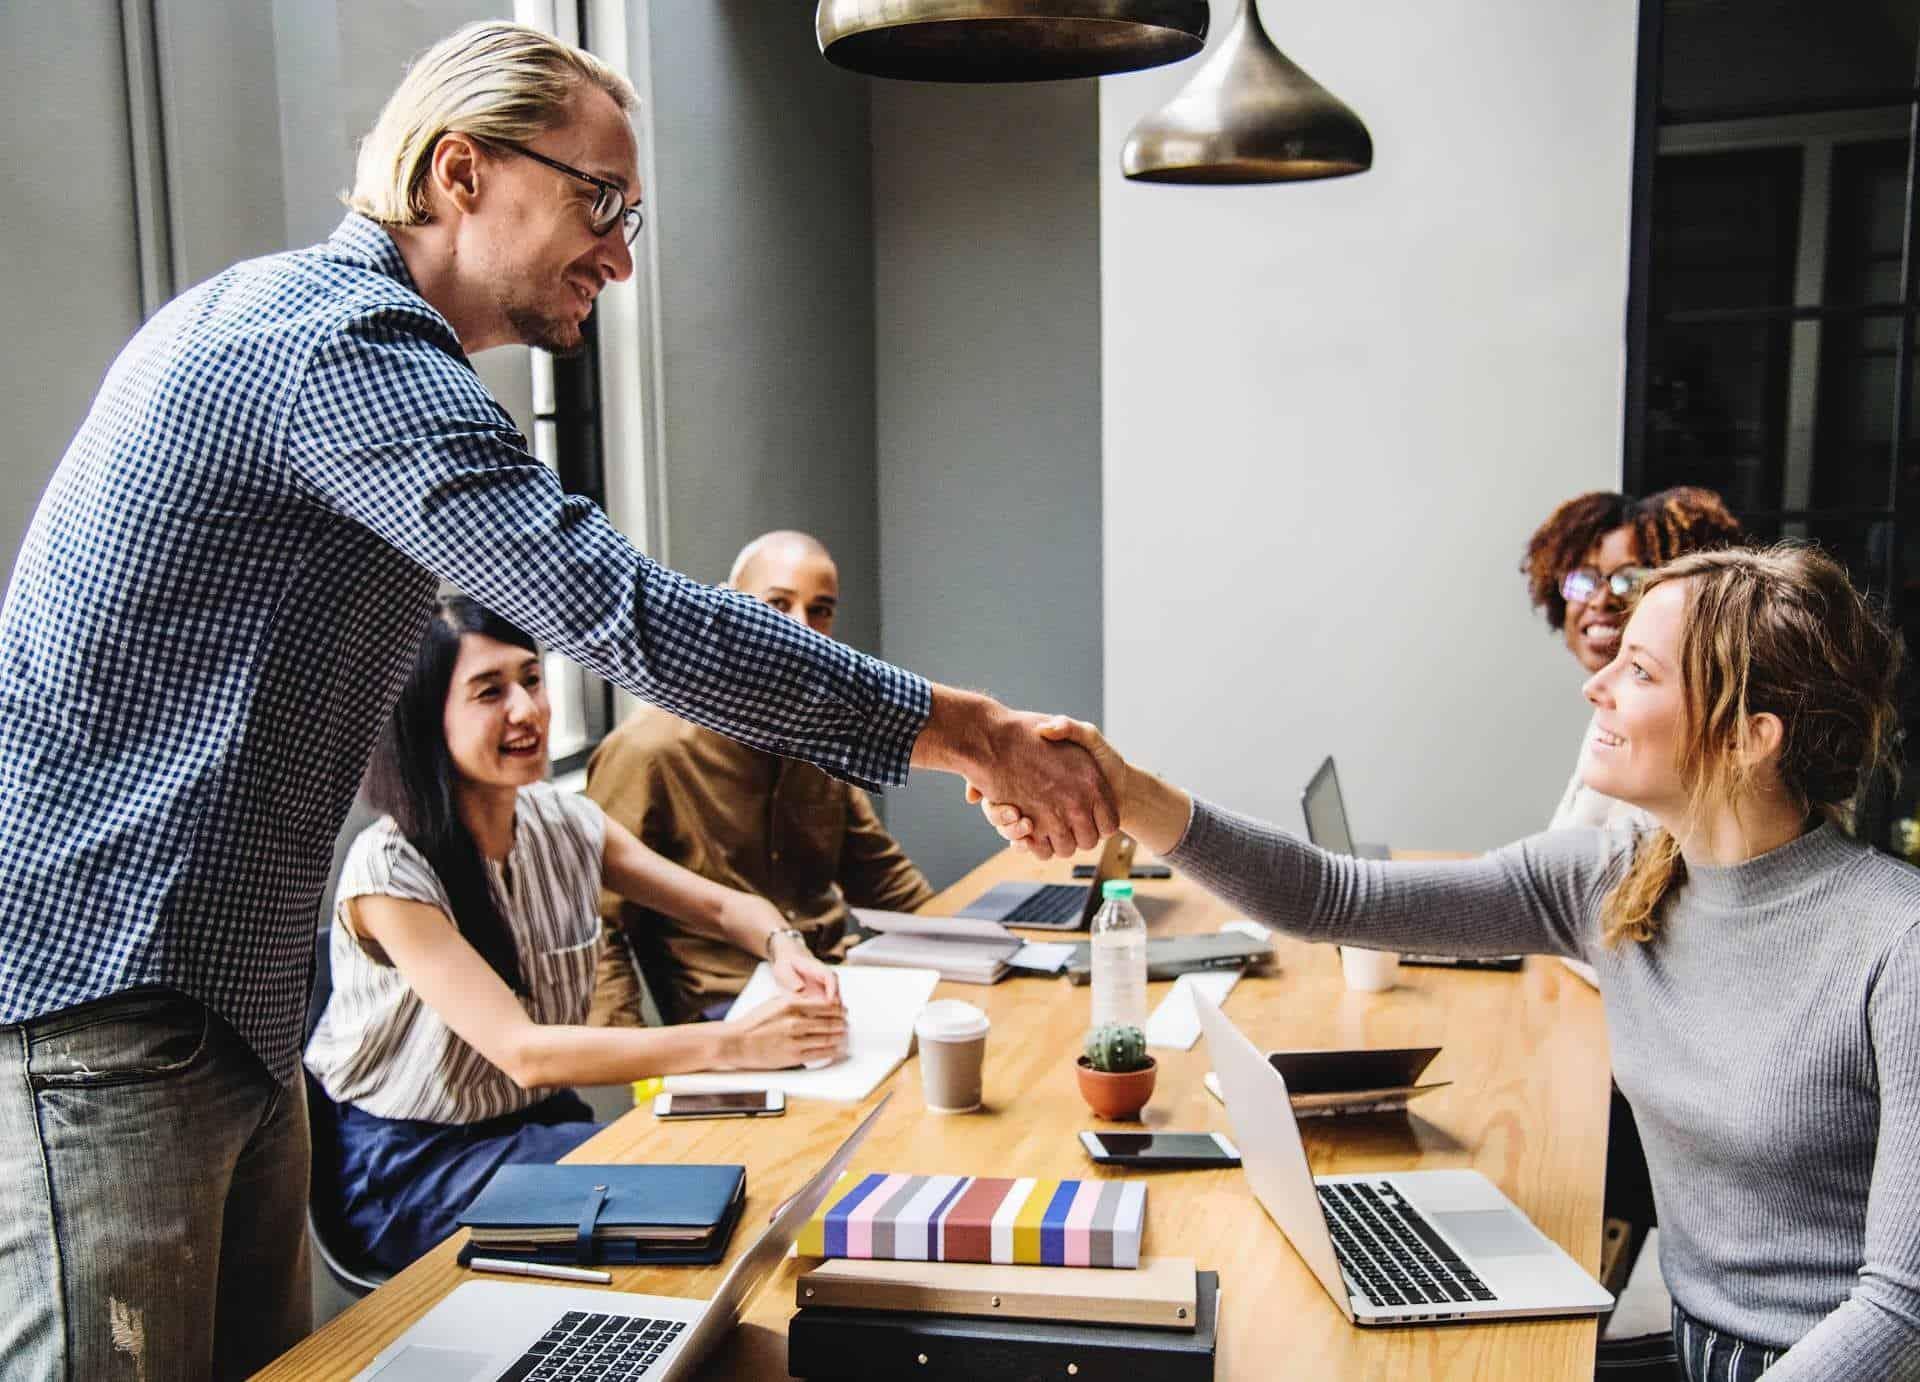 adult business deal colleague 1265902 - Corsi Finanziati